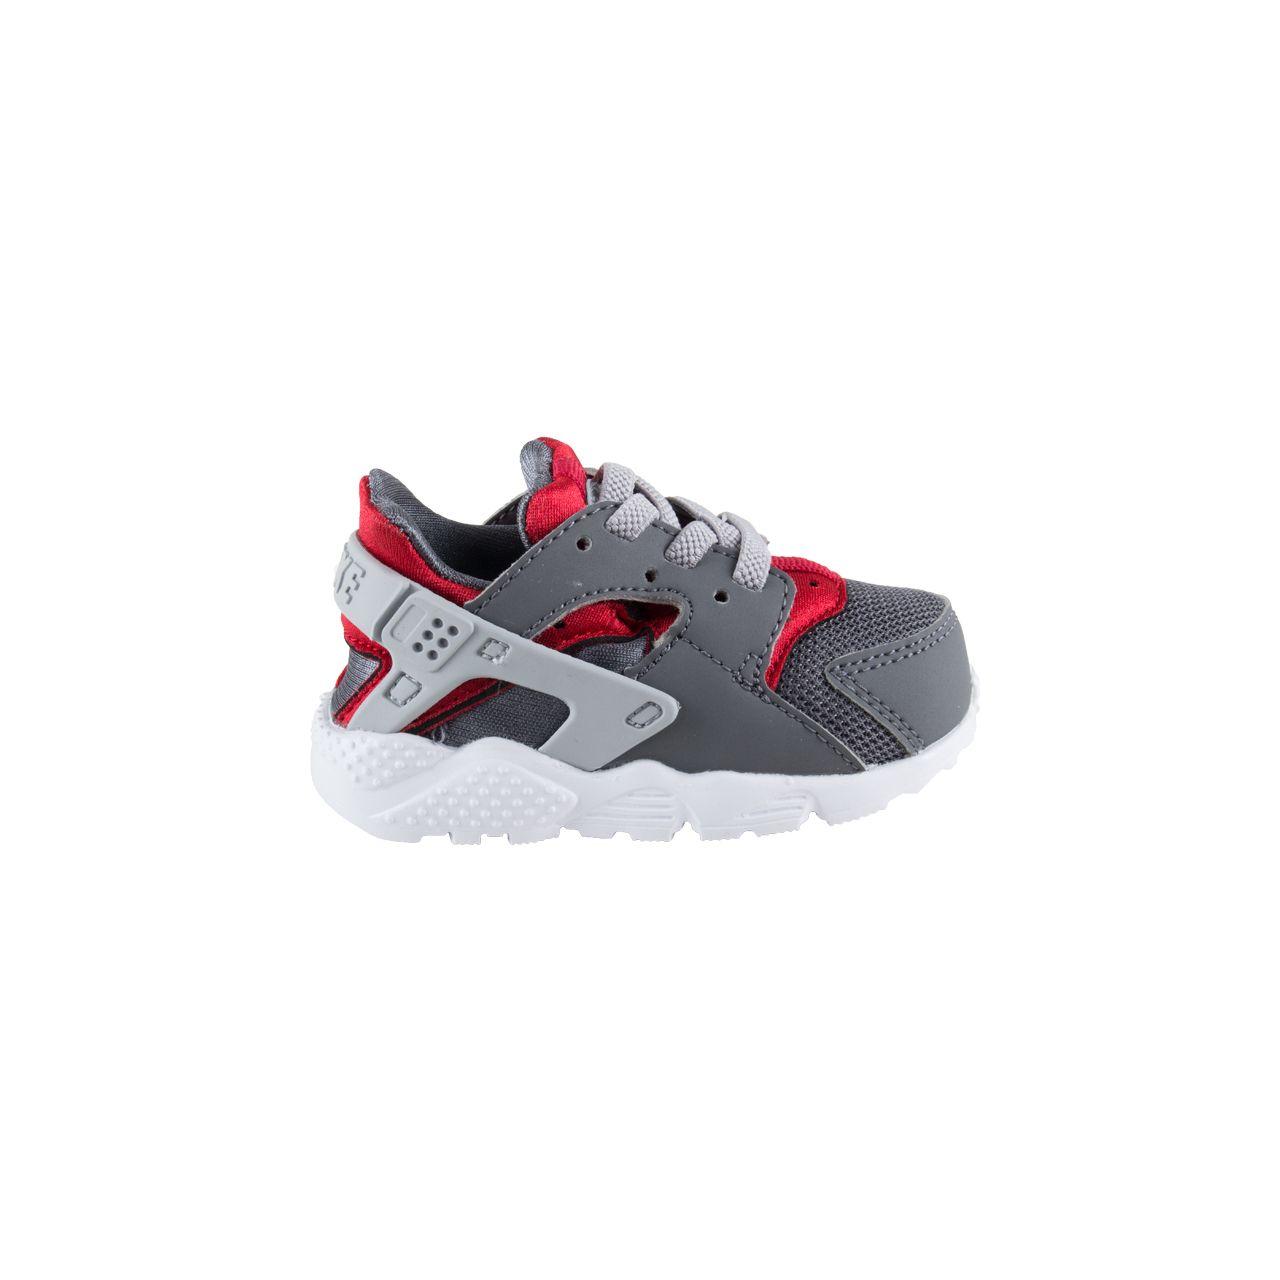 buy online 70a6b 73911 Nike Huarache Run TD Sneakers Baby Nike Huarache Run TD Sneakers Baby  bestellen bij PIM Sneakers